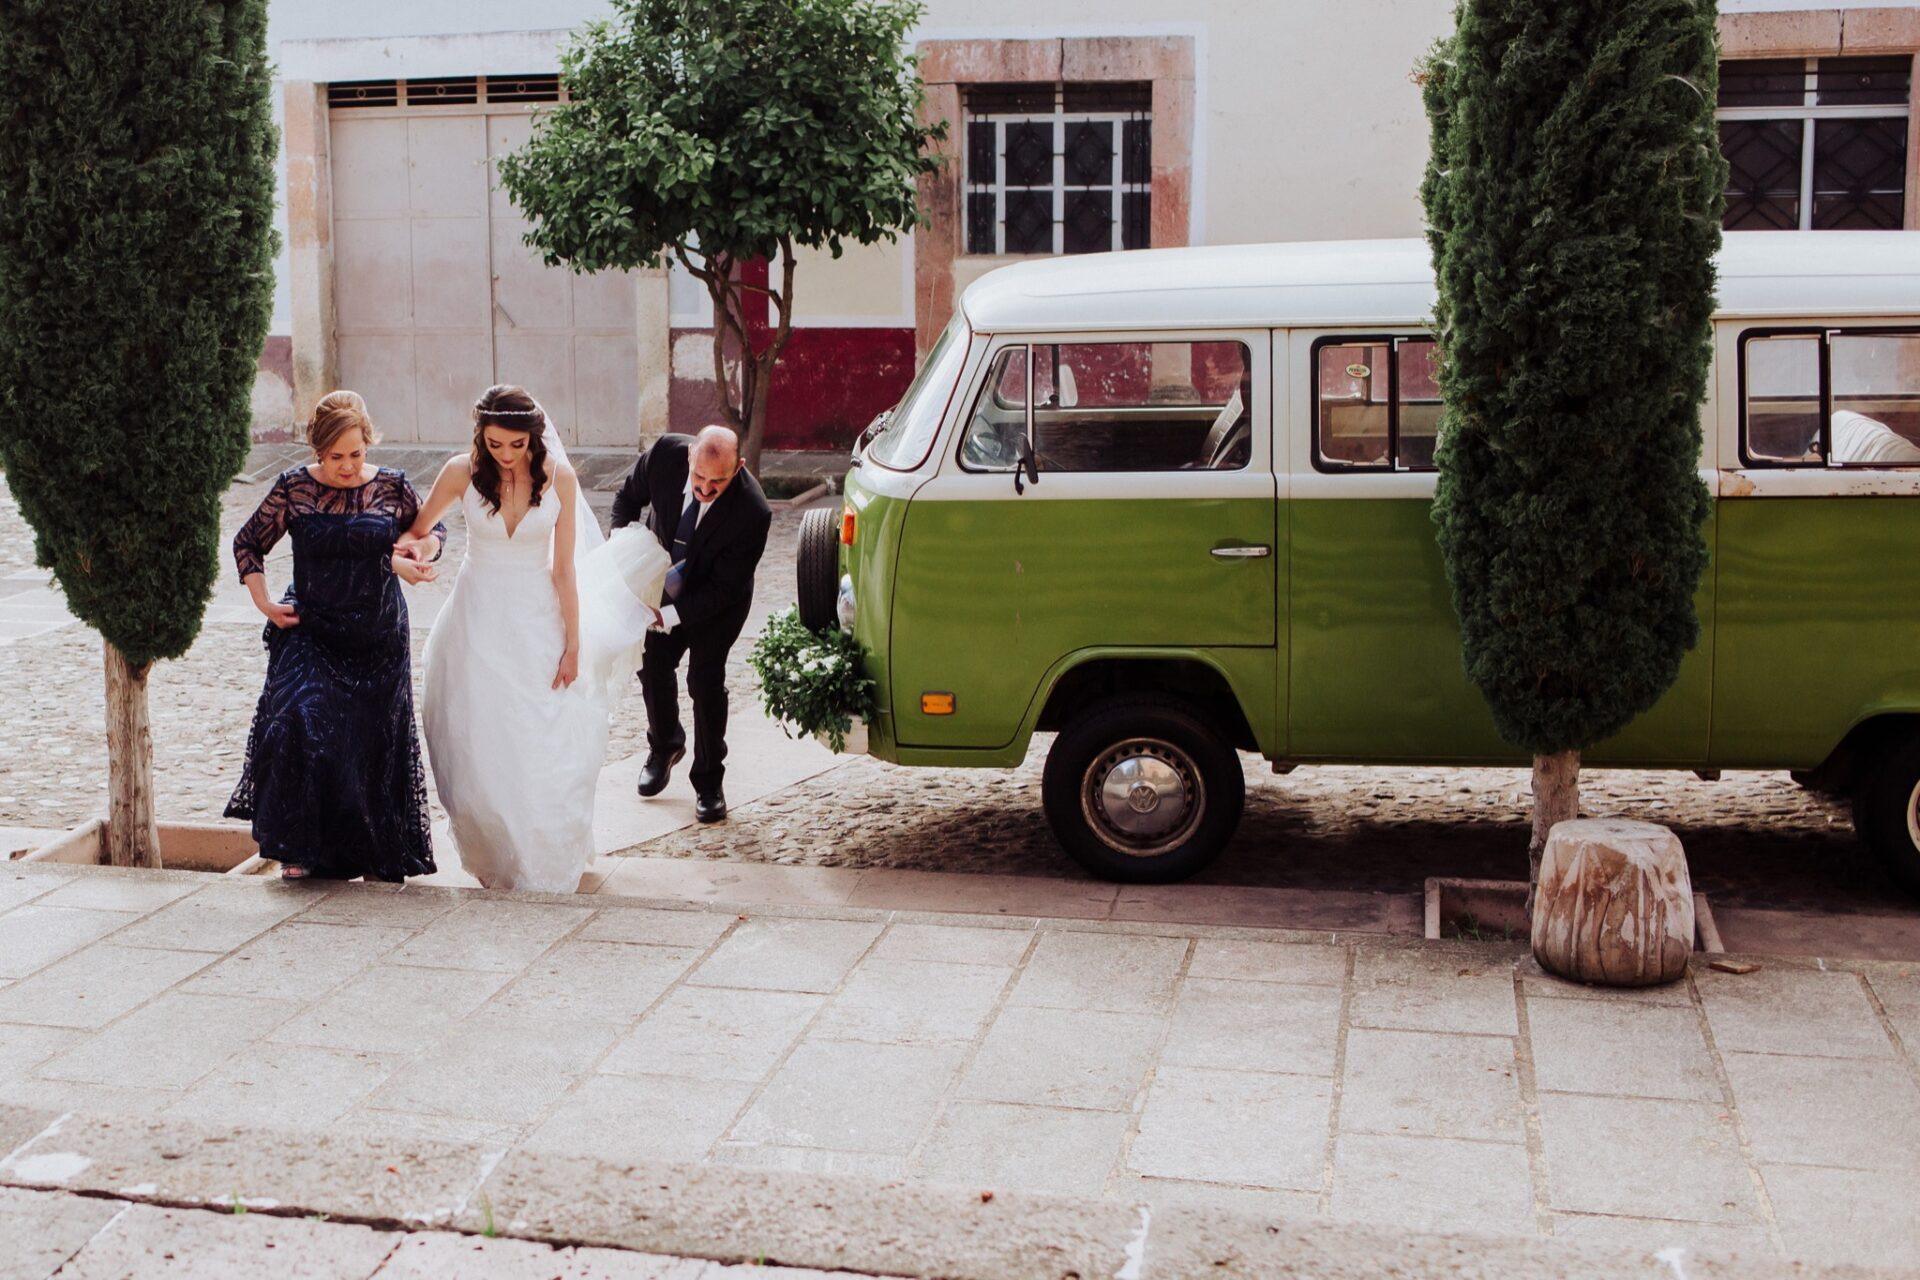 javier_noriega_fotografo_bodas_teul_zacatecas_wedding_photographer5a